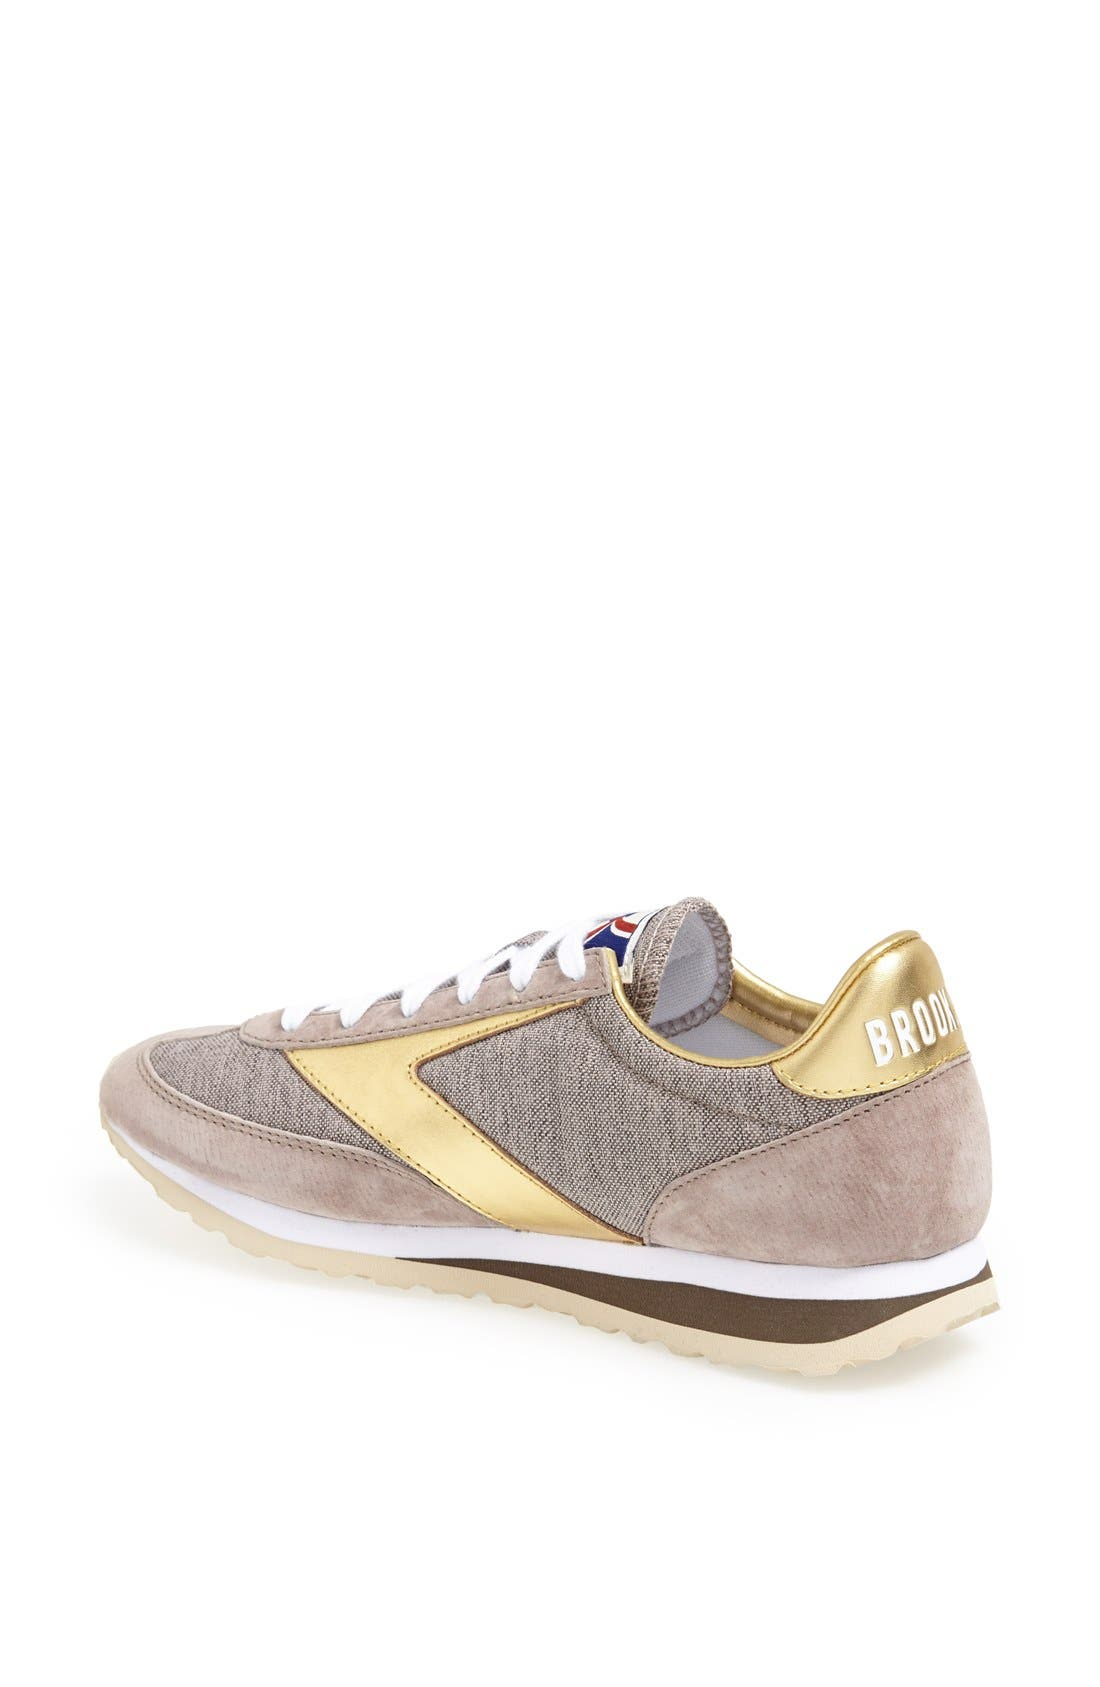 'Vanguard' Sneaker,                             Alternate thumbnail 160, color,